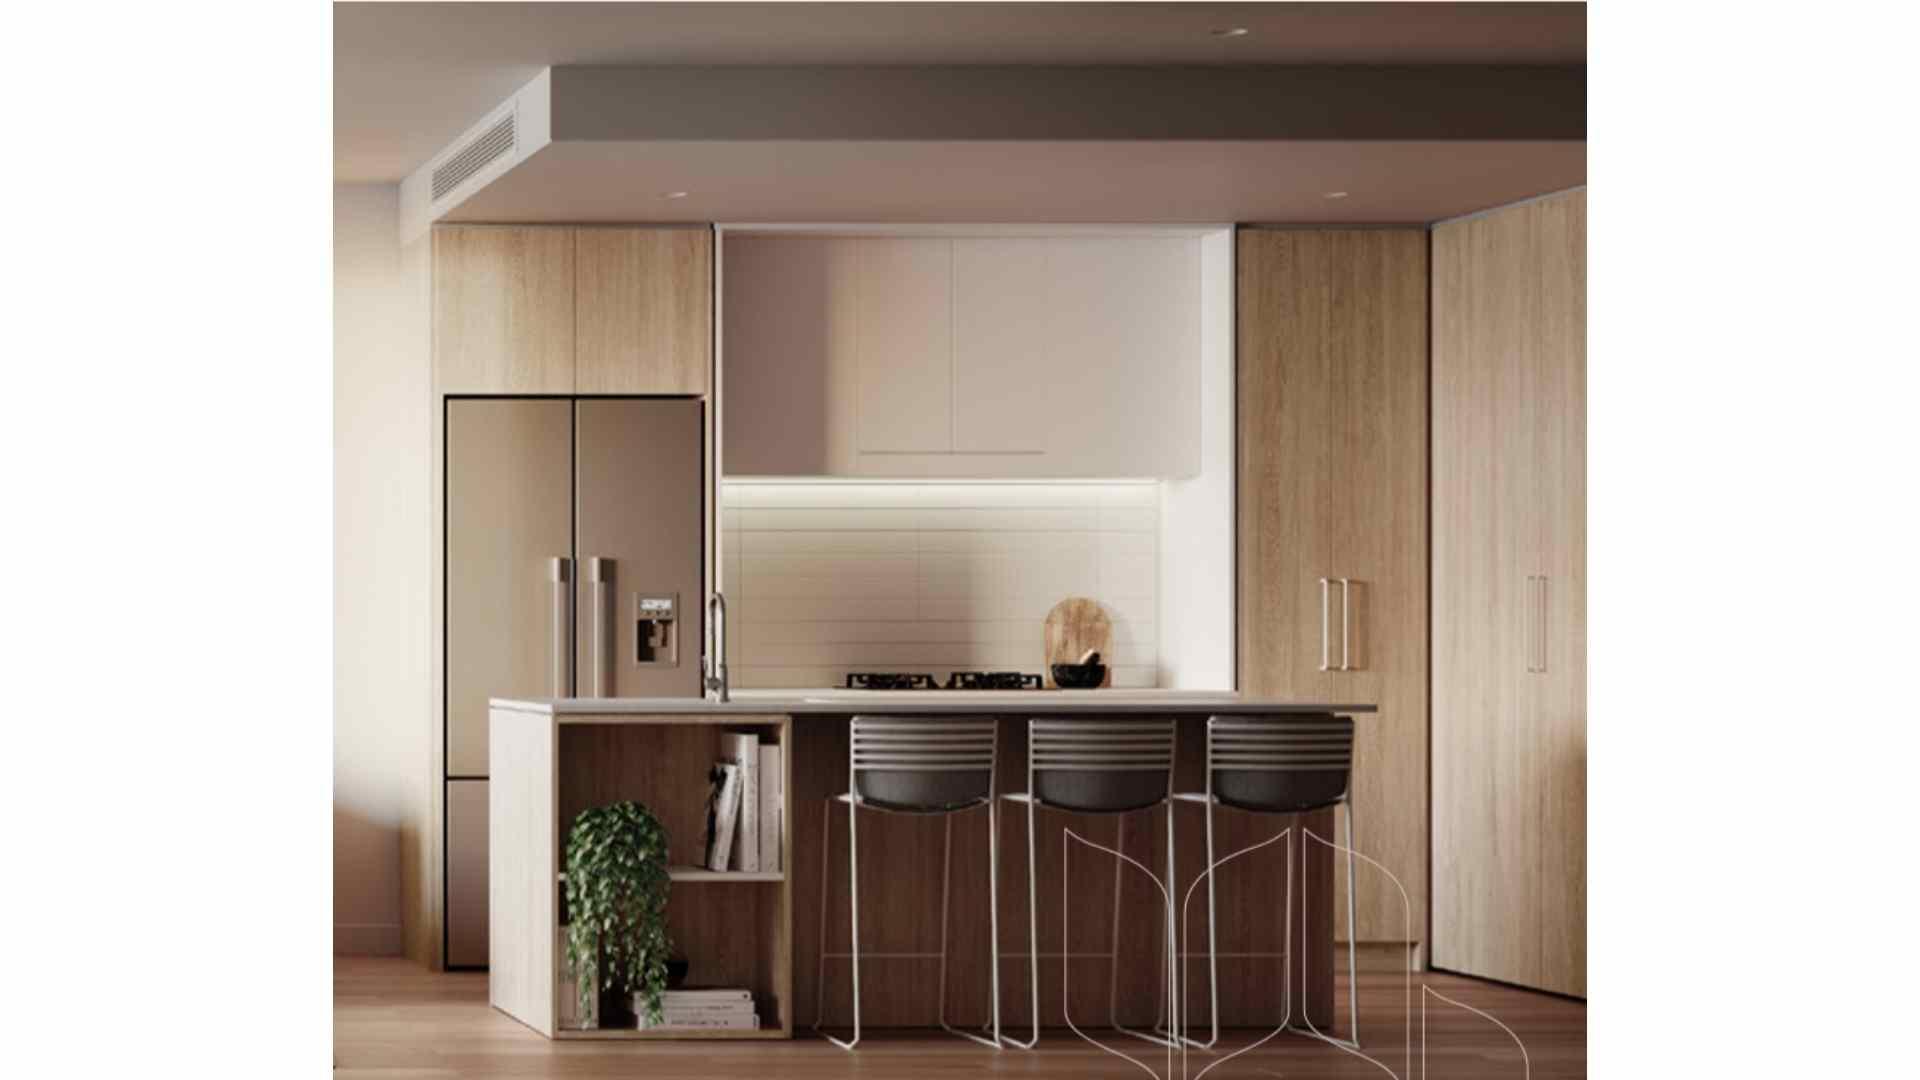 beige and white kitchen, 3 bar stool